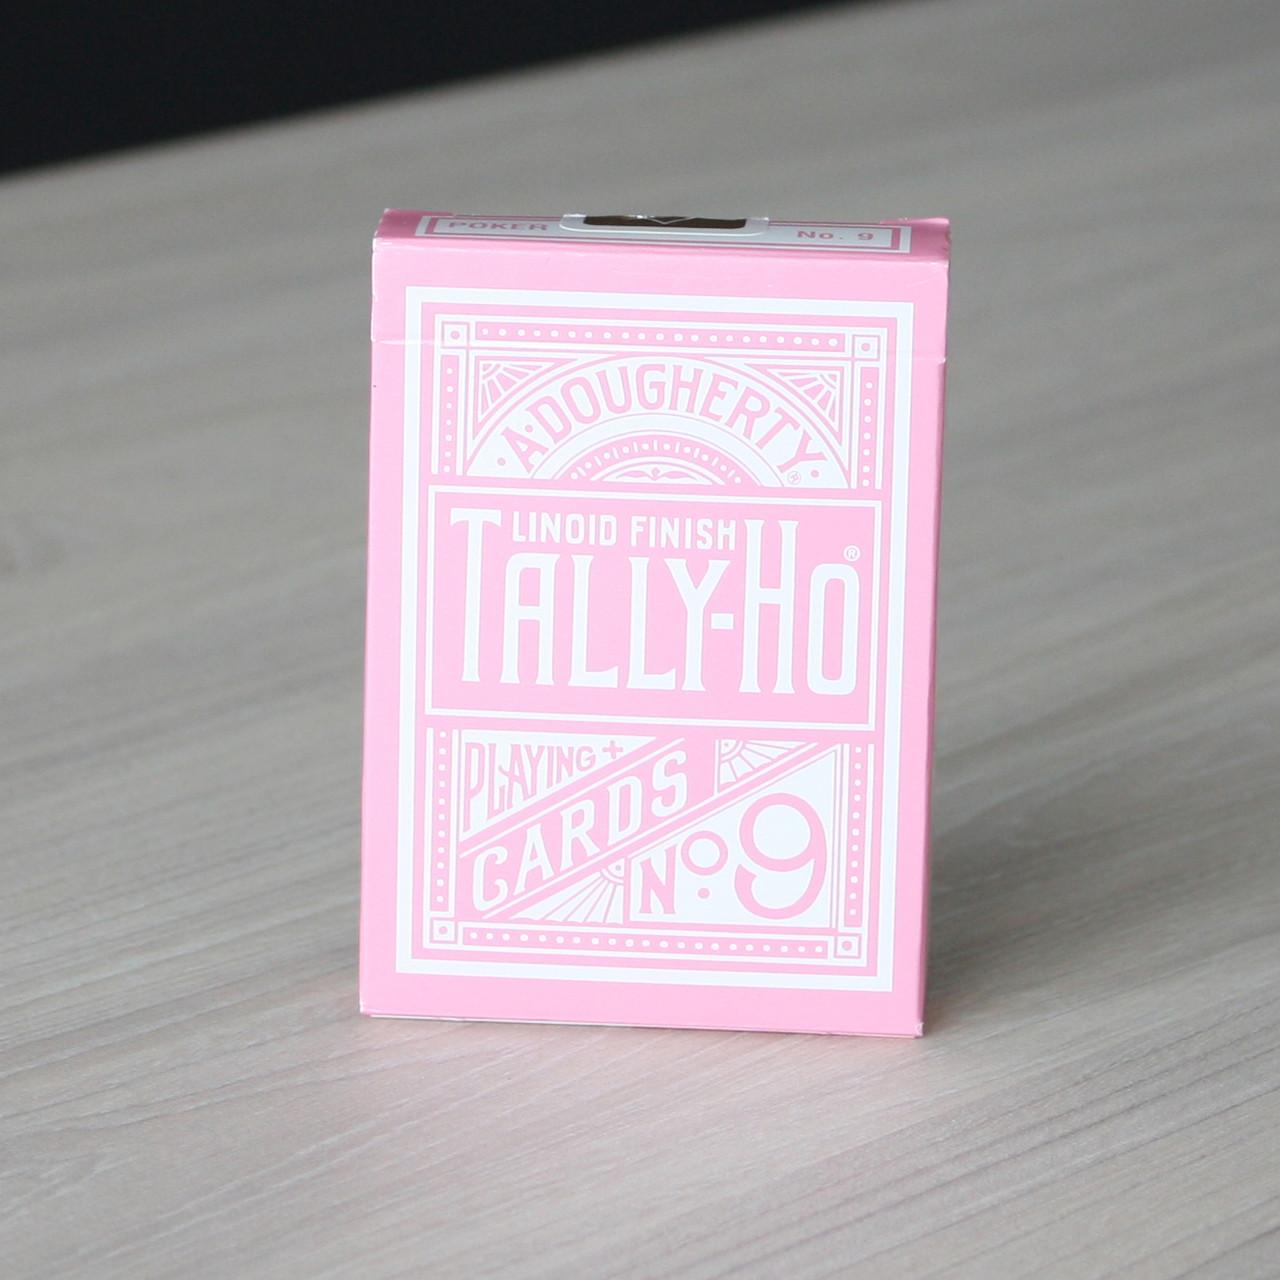 Карты игральные   Tally Ho Reverse Circle back (Pink) Limited Ed. by Aloy Studios / USPCC